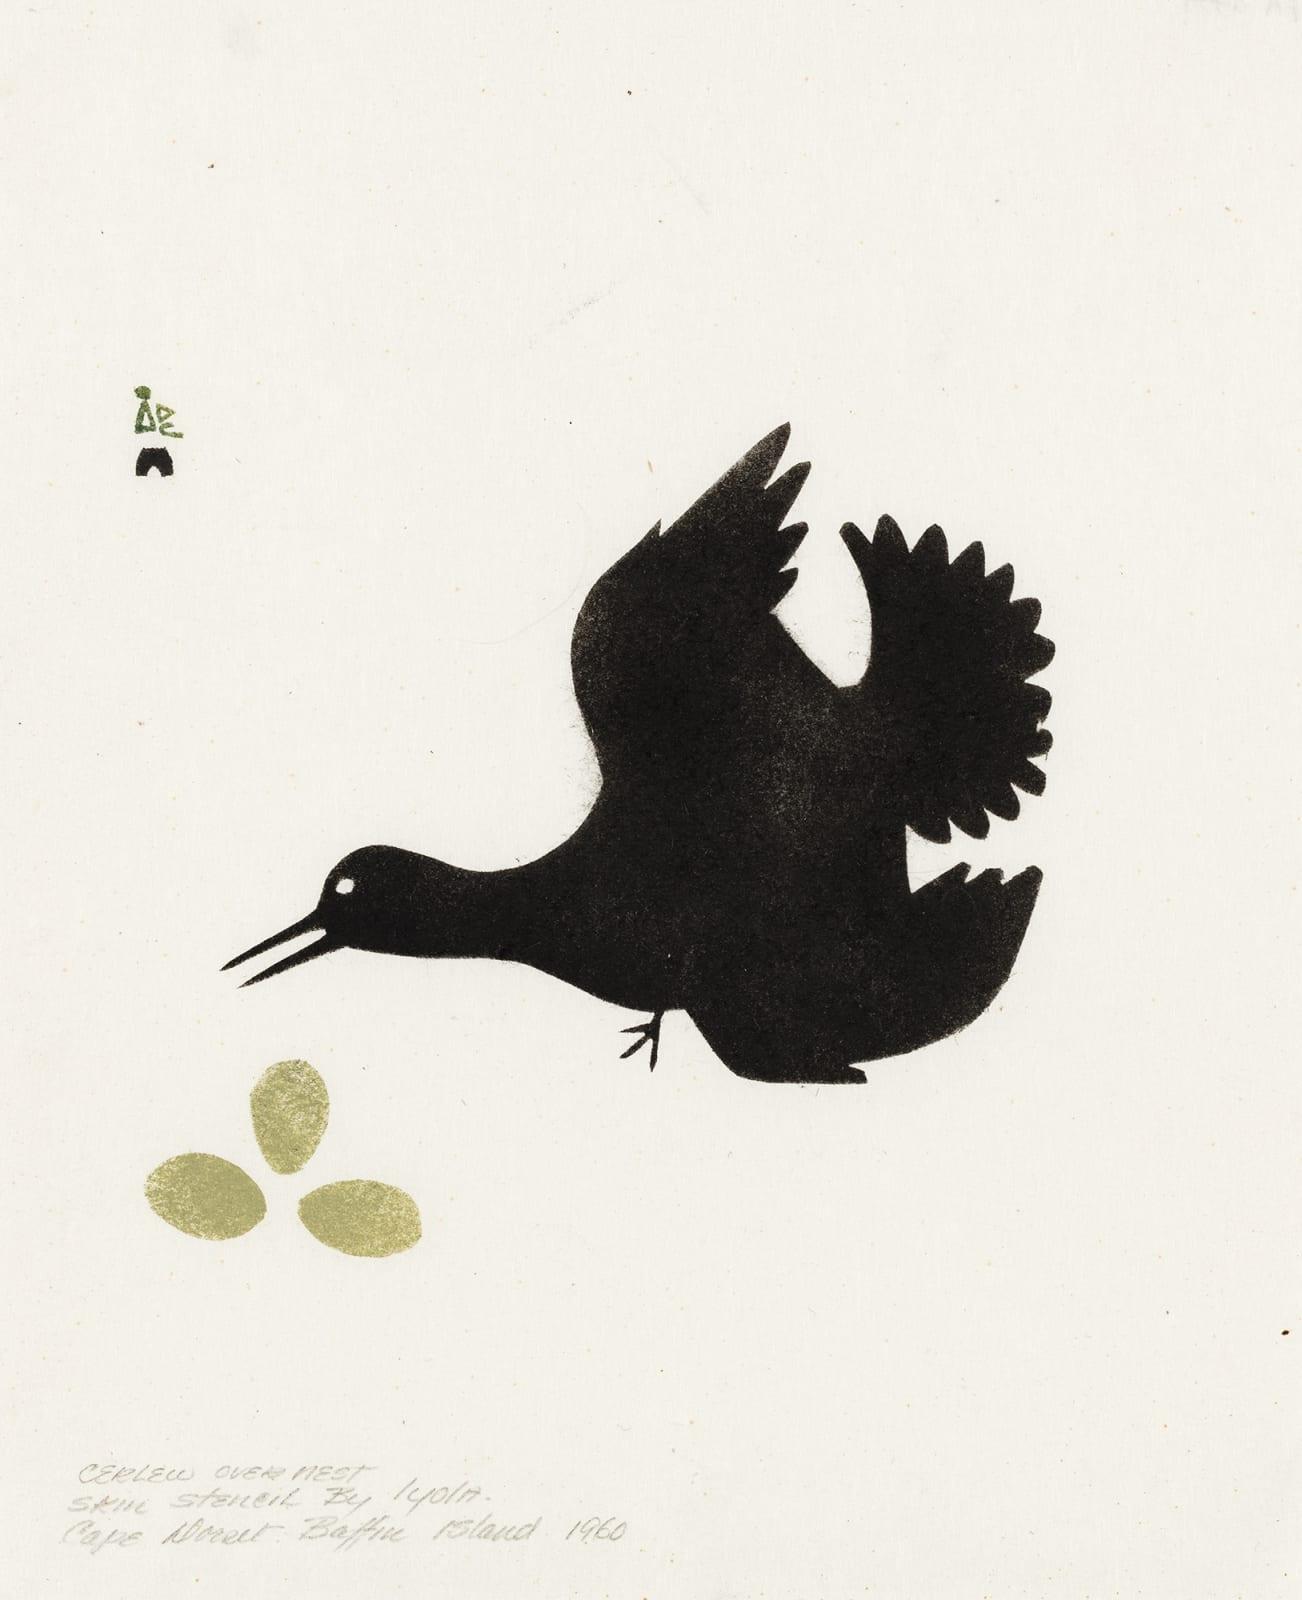 Lot 104 IYOLA KINGWATSIAK (1933-2000) m., KINNGAIT (CAPE DORSET) Curlew Over Nest*, 1960 sealskin stencil, 10.5 x 8.5 in (26.7 x 21.6 cm). Estimate: $2,000— $3,000 Price realized: $3,840